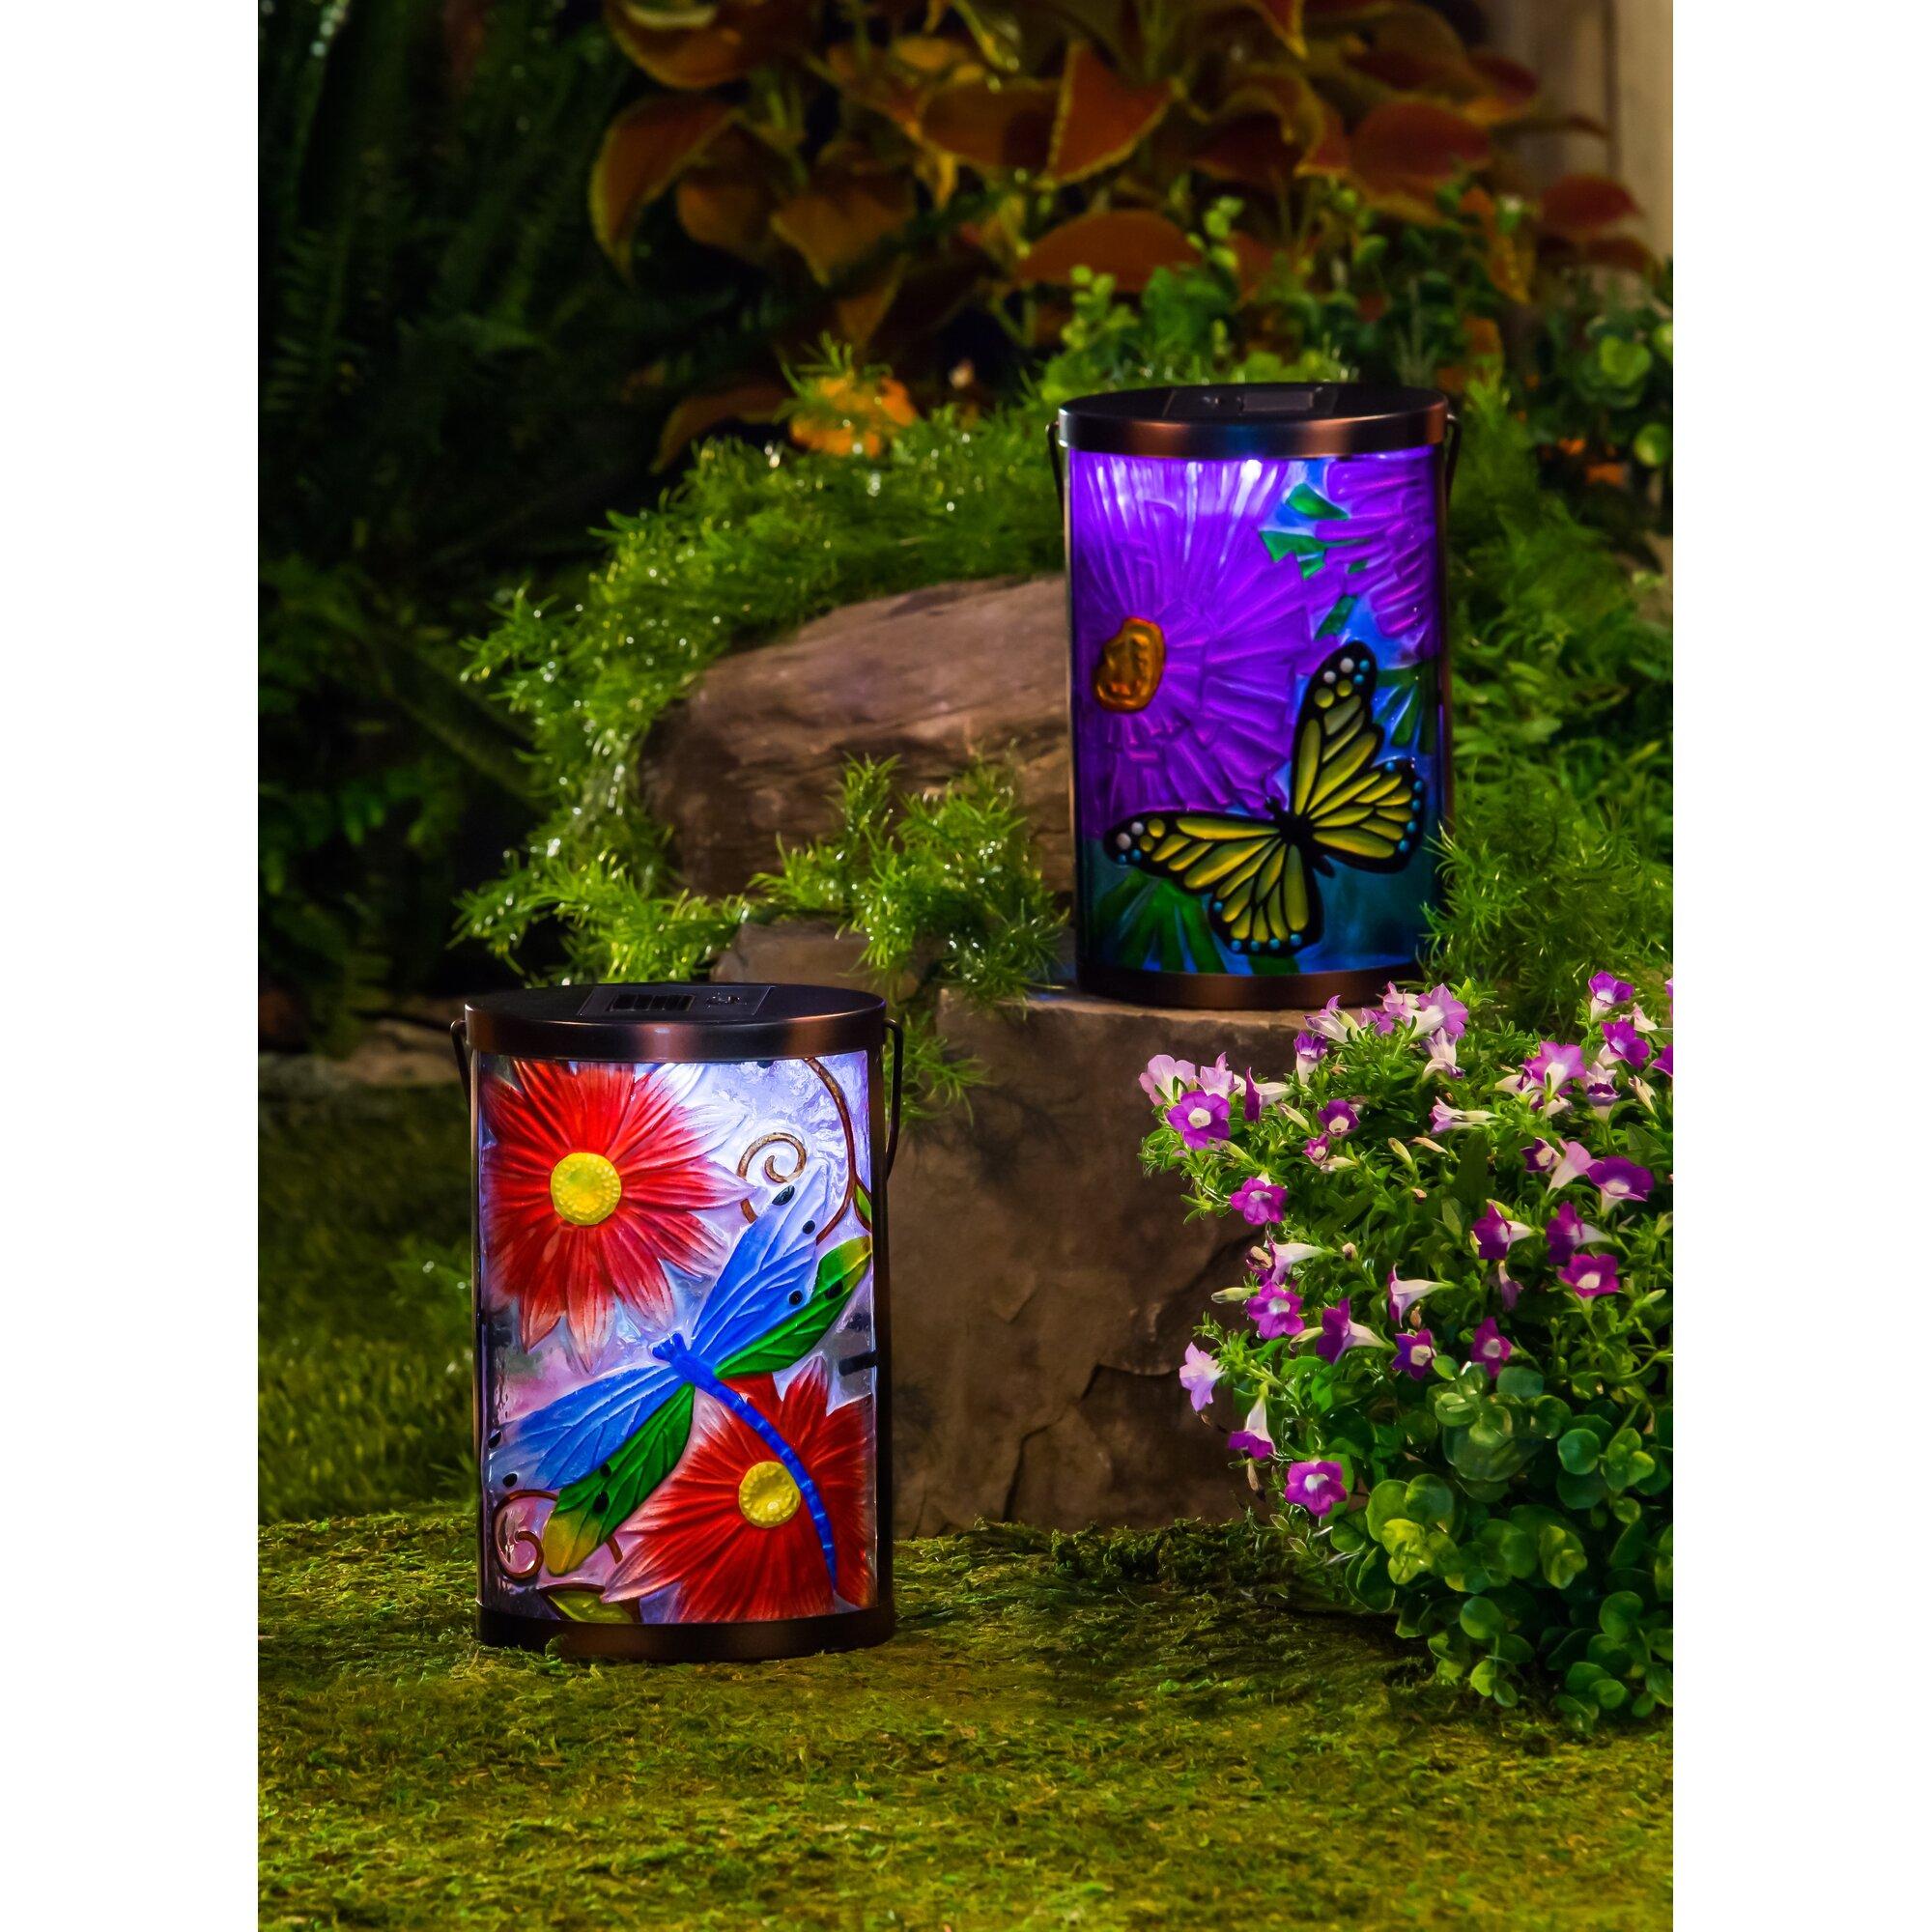 design at power on one decor for solar of sale dollar garden spray tar lights